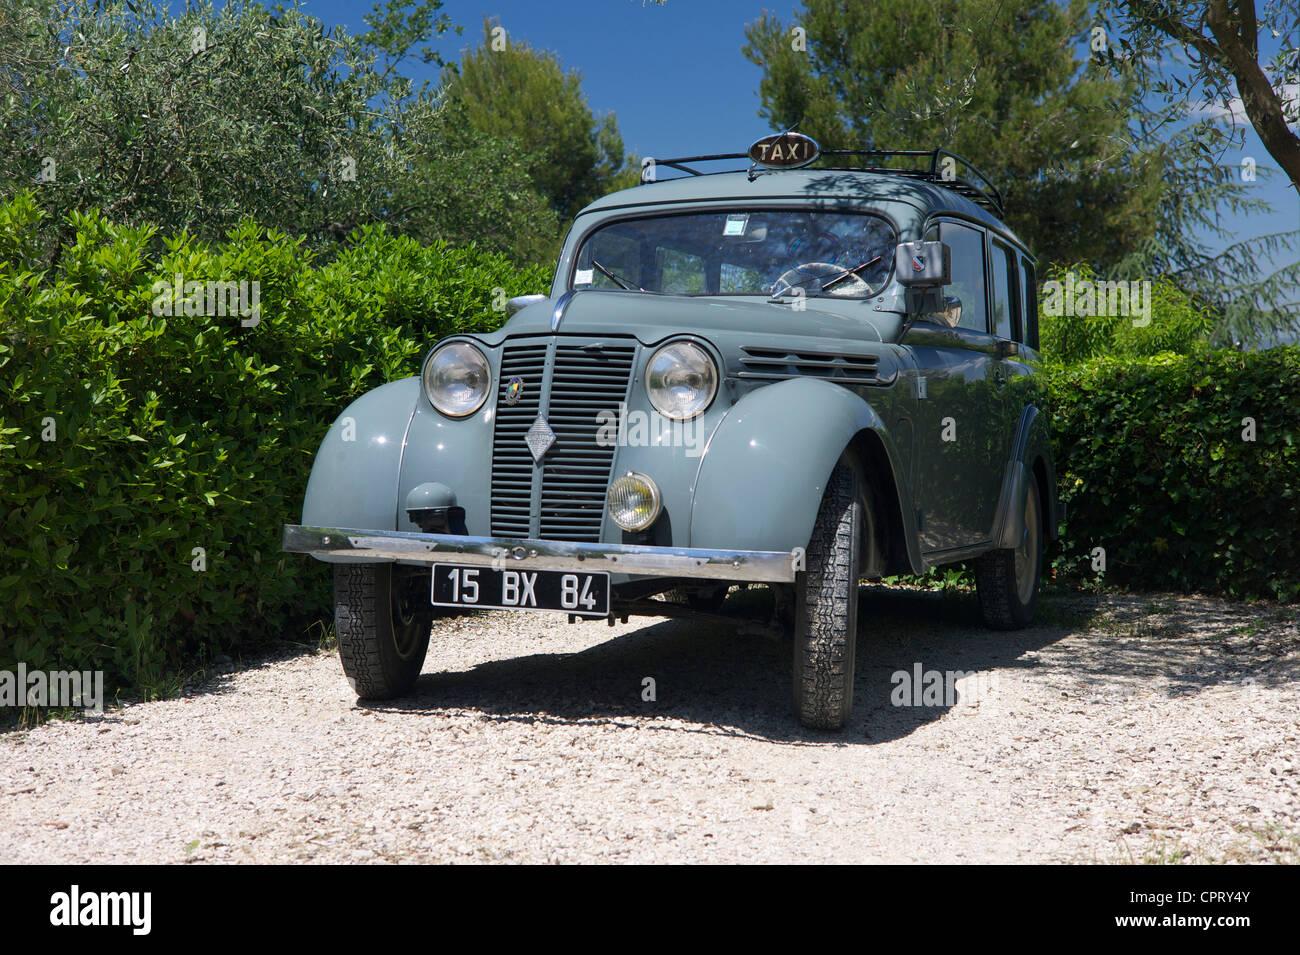 Renault Dauphinoise (Juvaquatre break) vintage car, France Stock ...